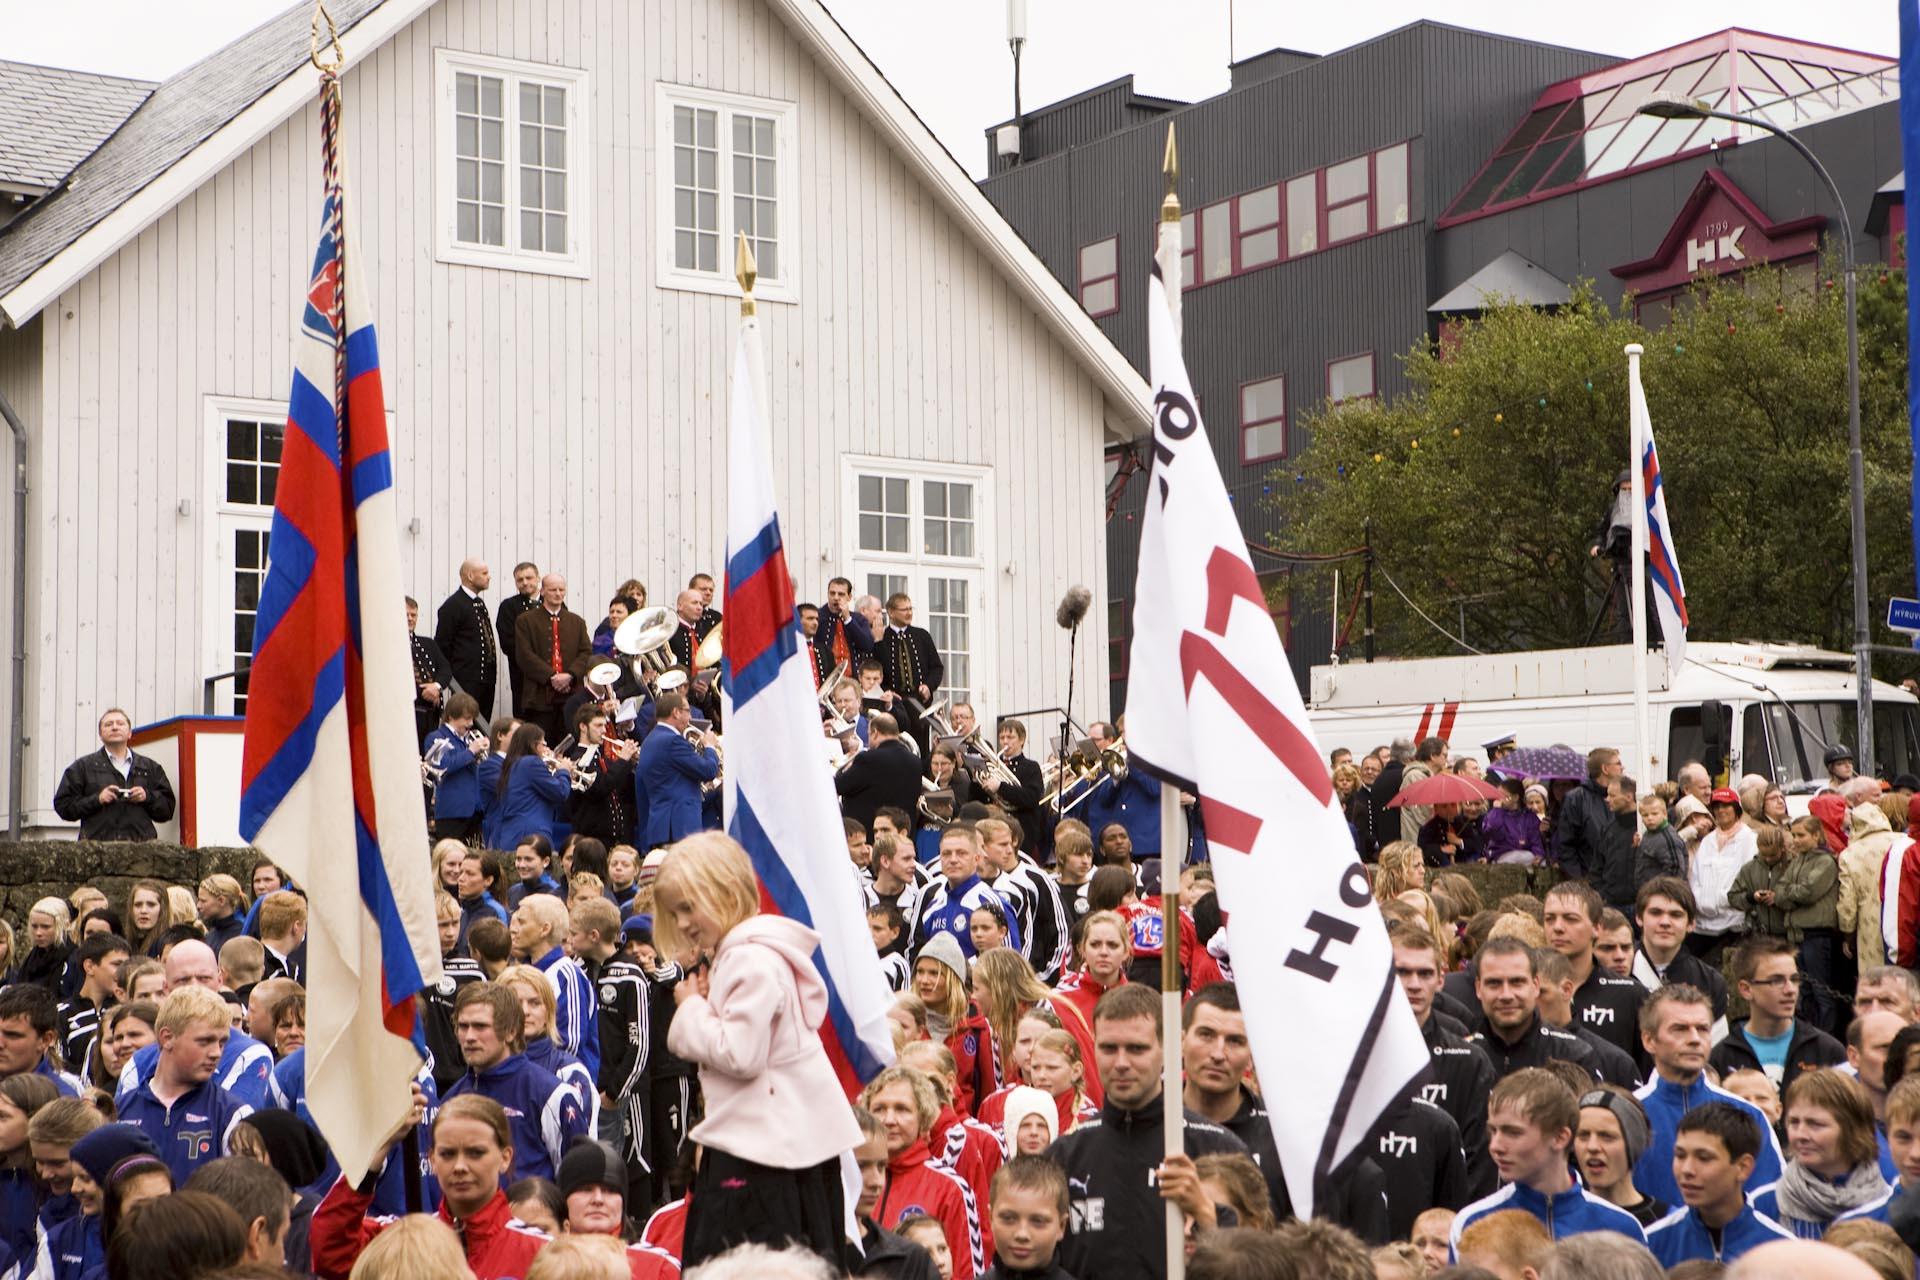 20090728-1704-Faeroerne.jpg